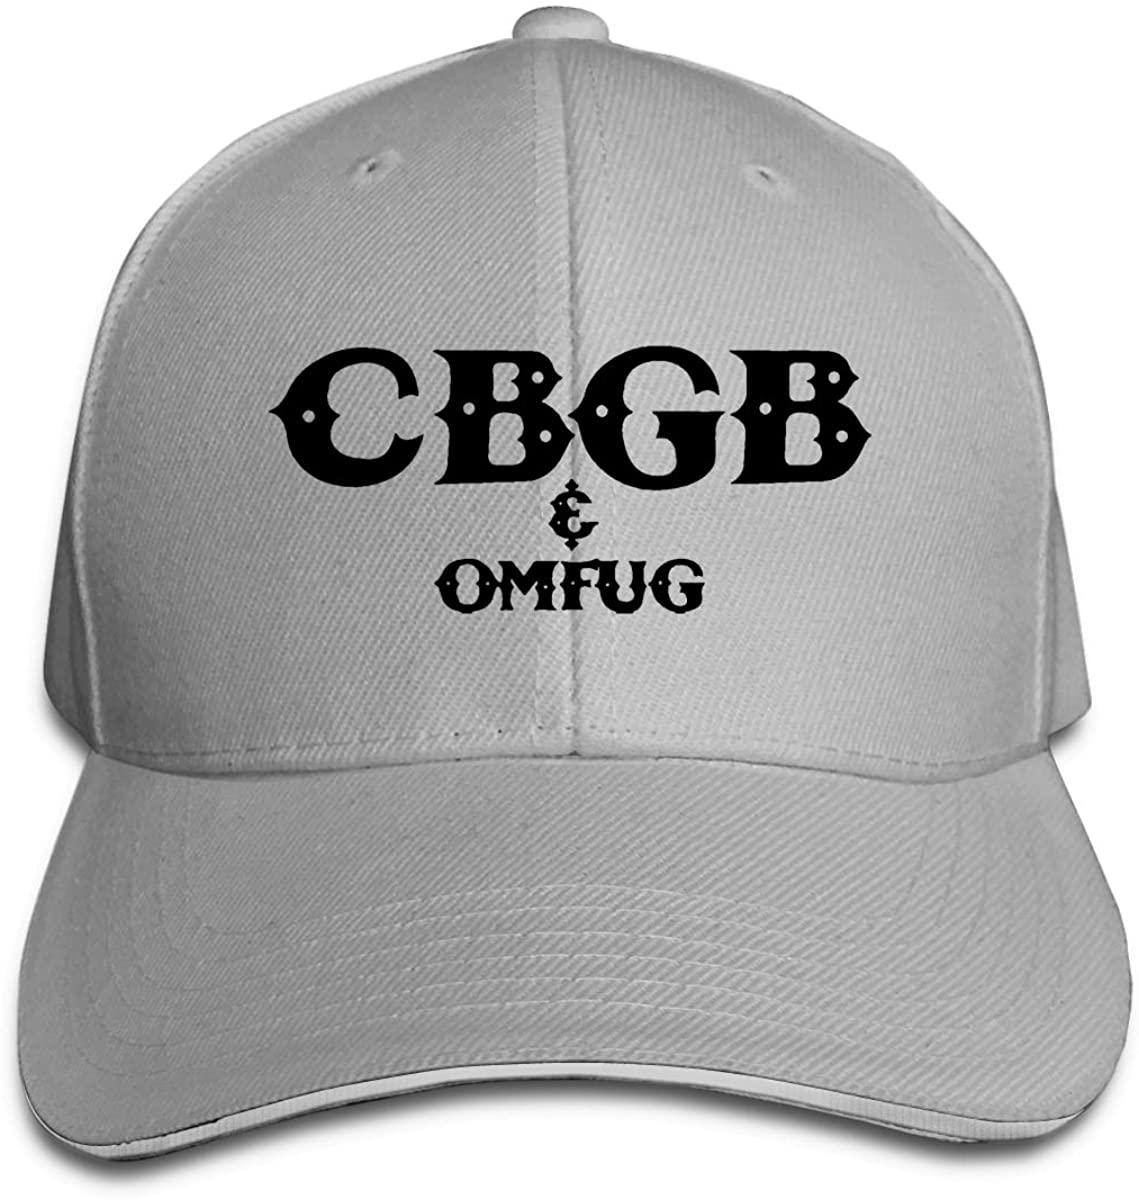 CBGB All-Match Casual Sunshade Cap, Adjustable